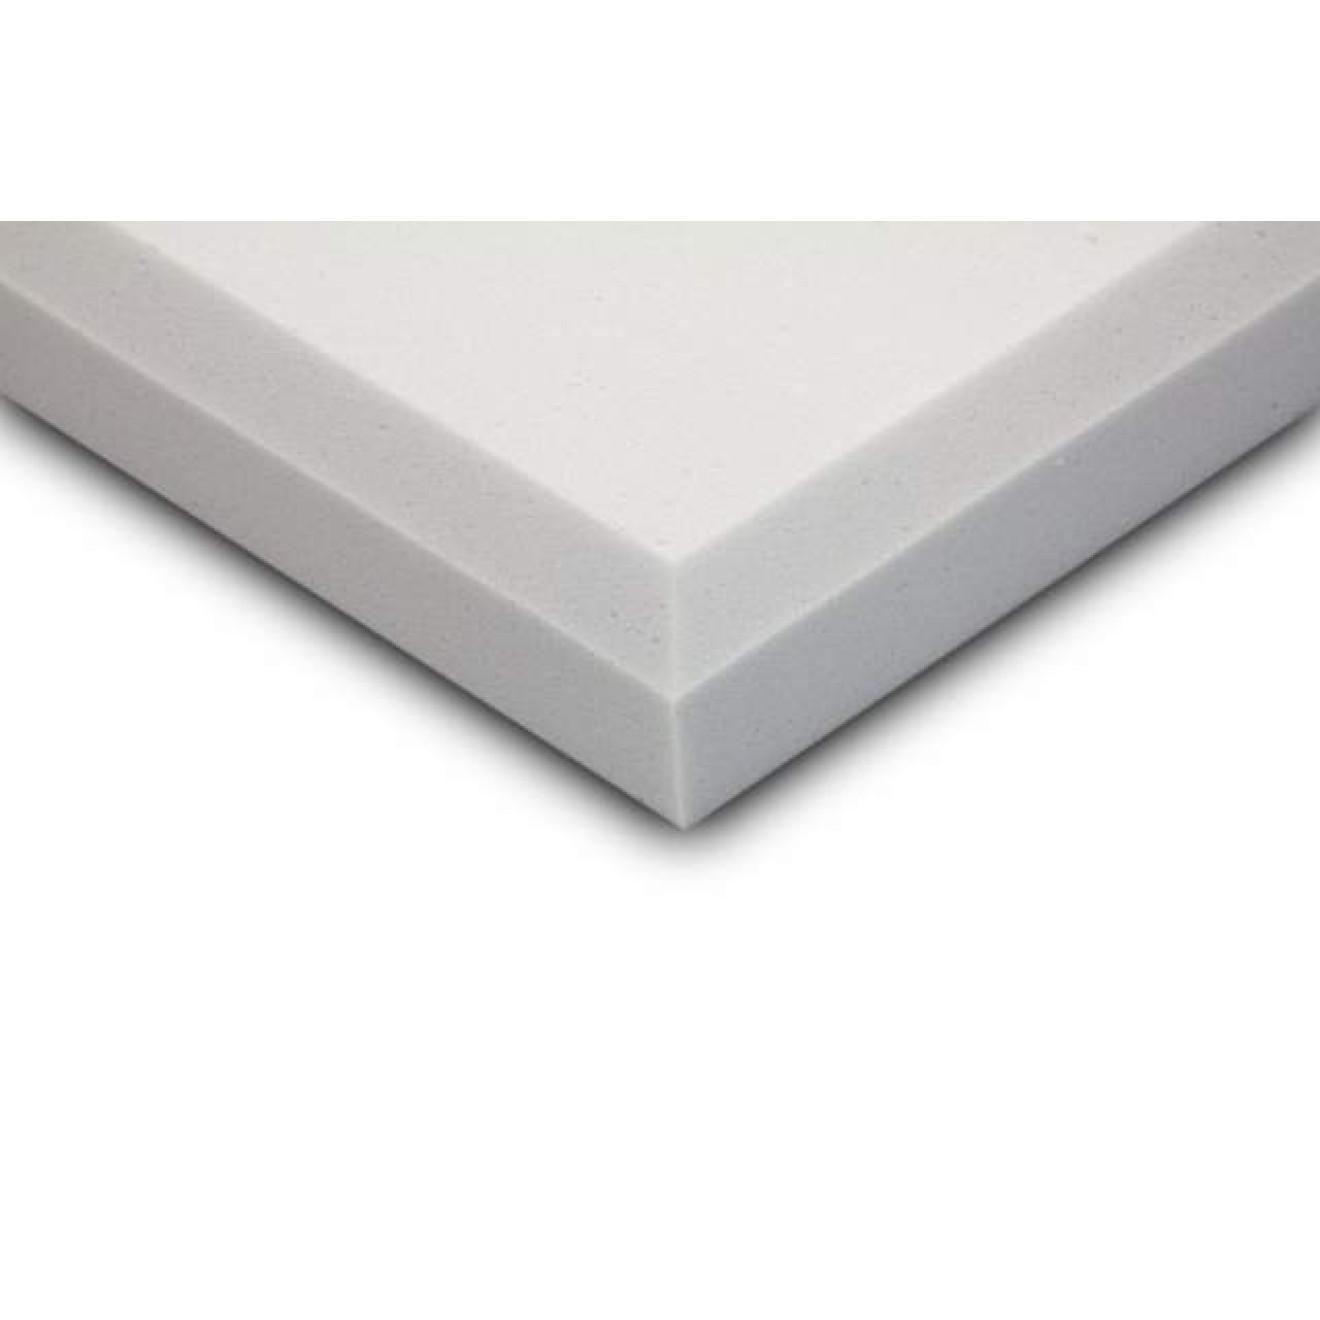 handmuster baso decor grau schaumstoff direkt vom. Black Bedroom Furniture Sets. Home Design Ideas